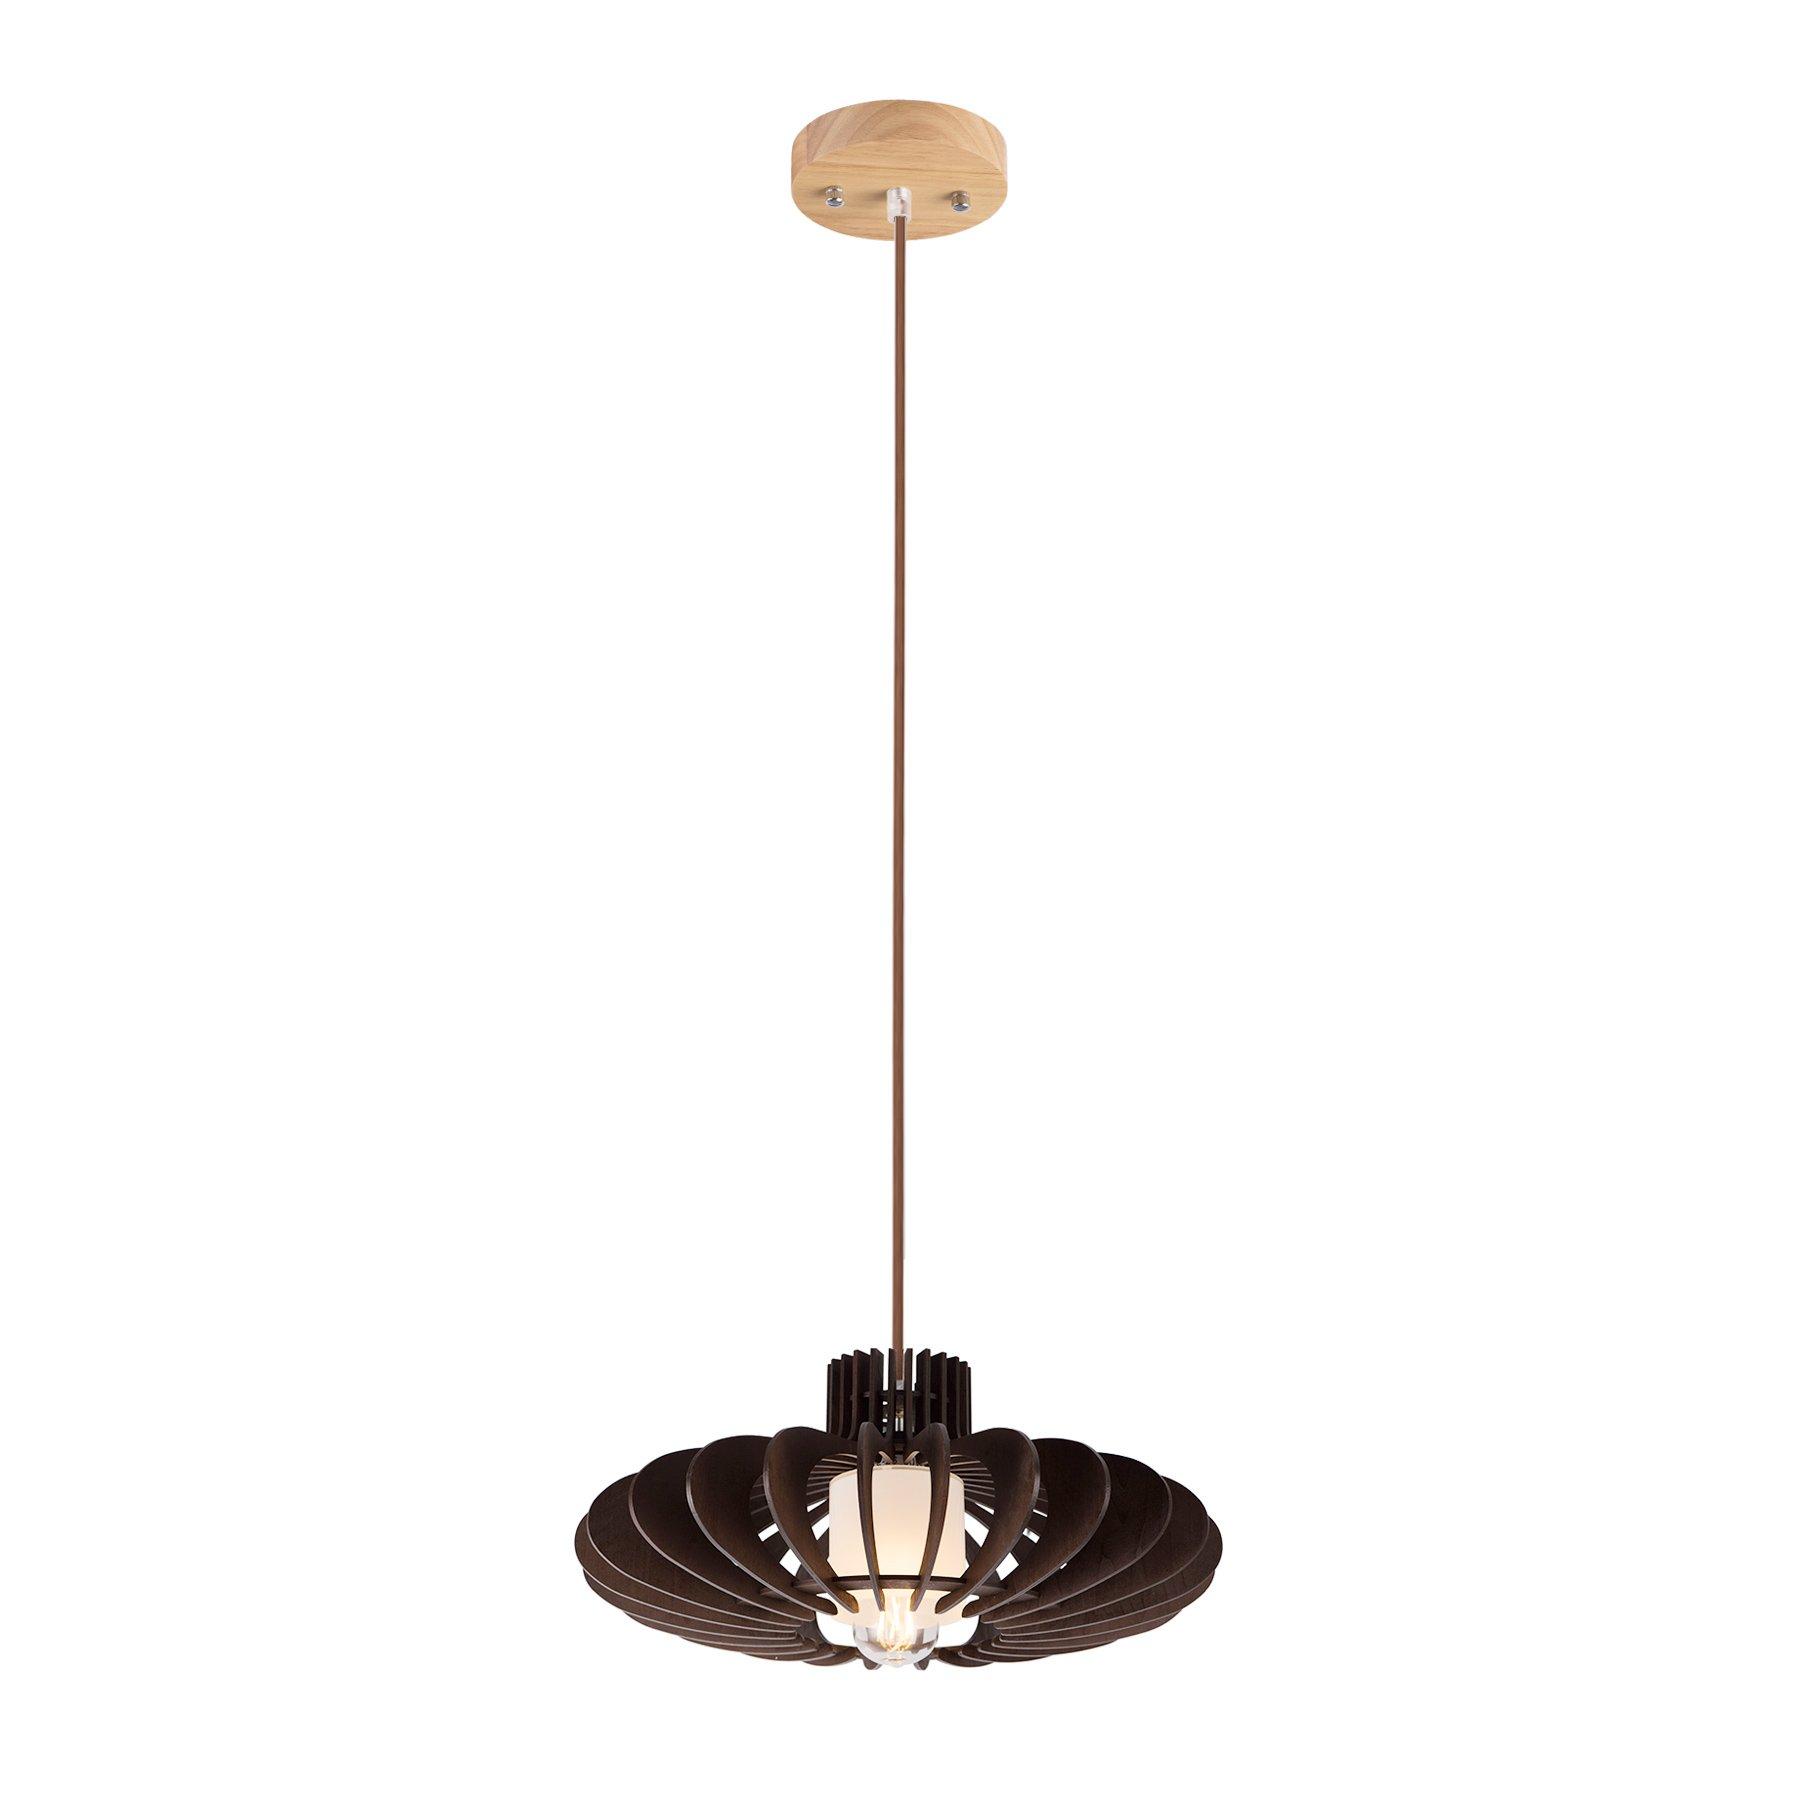 MAYKKE Oban Medium Wooden Pendant Lamp   Lantern Style with Dark Brown Rings, Hanging Light with Adjustable Cord   Walnut Wood Finish, MDB1040201 by Maykke (Image #2)